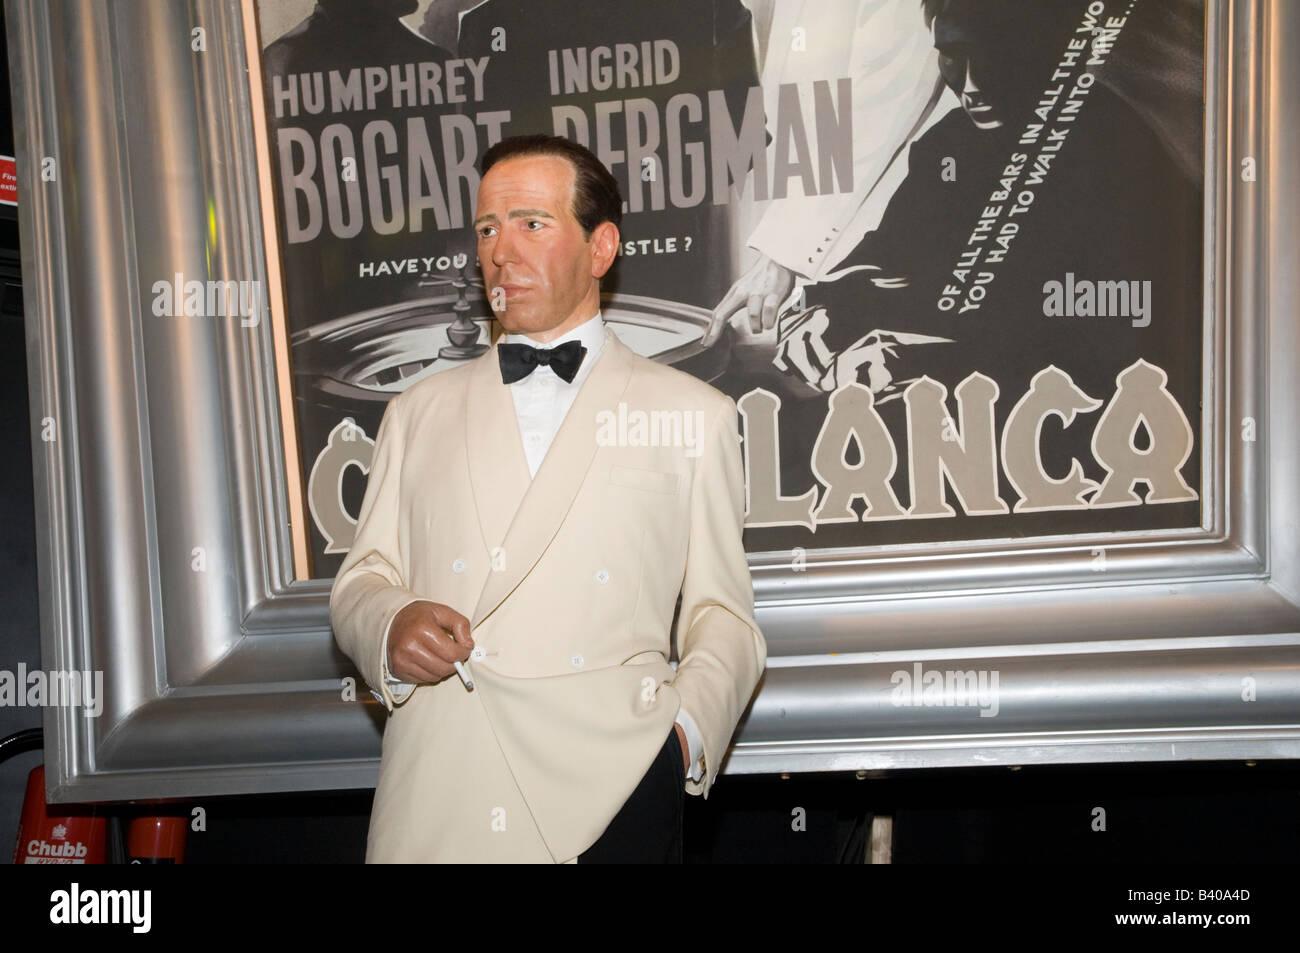 Waxwork model of Humphrey Bogart in the film Casablanca at Madame Tussauds, London, UK - Stock Image